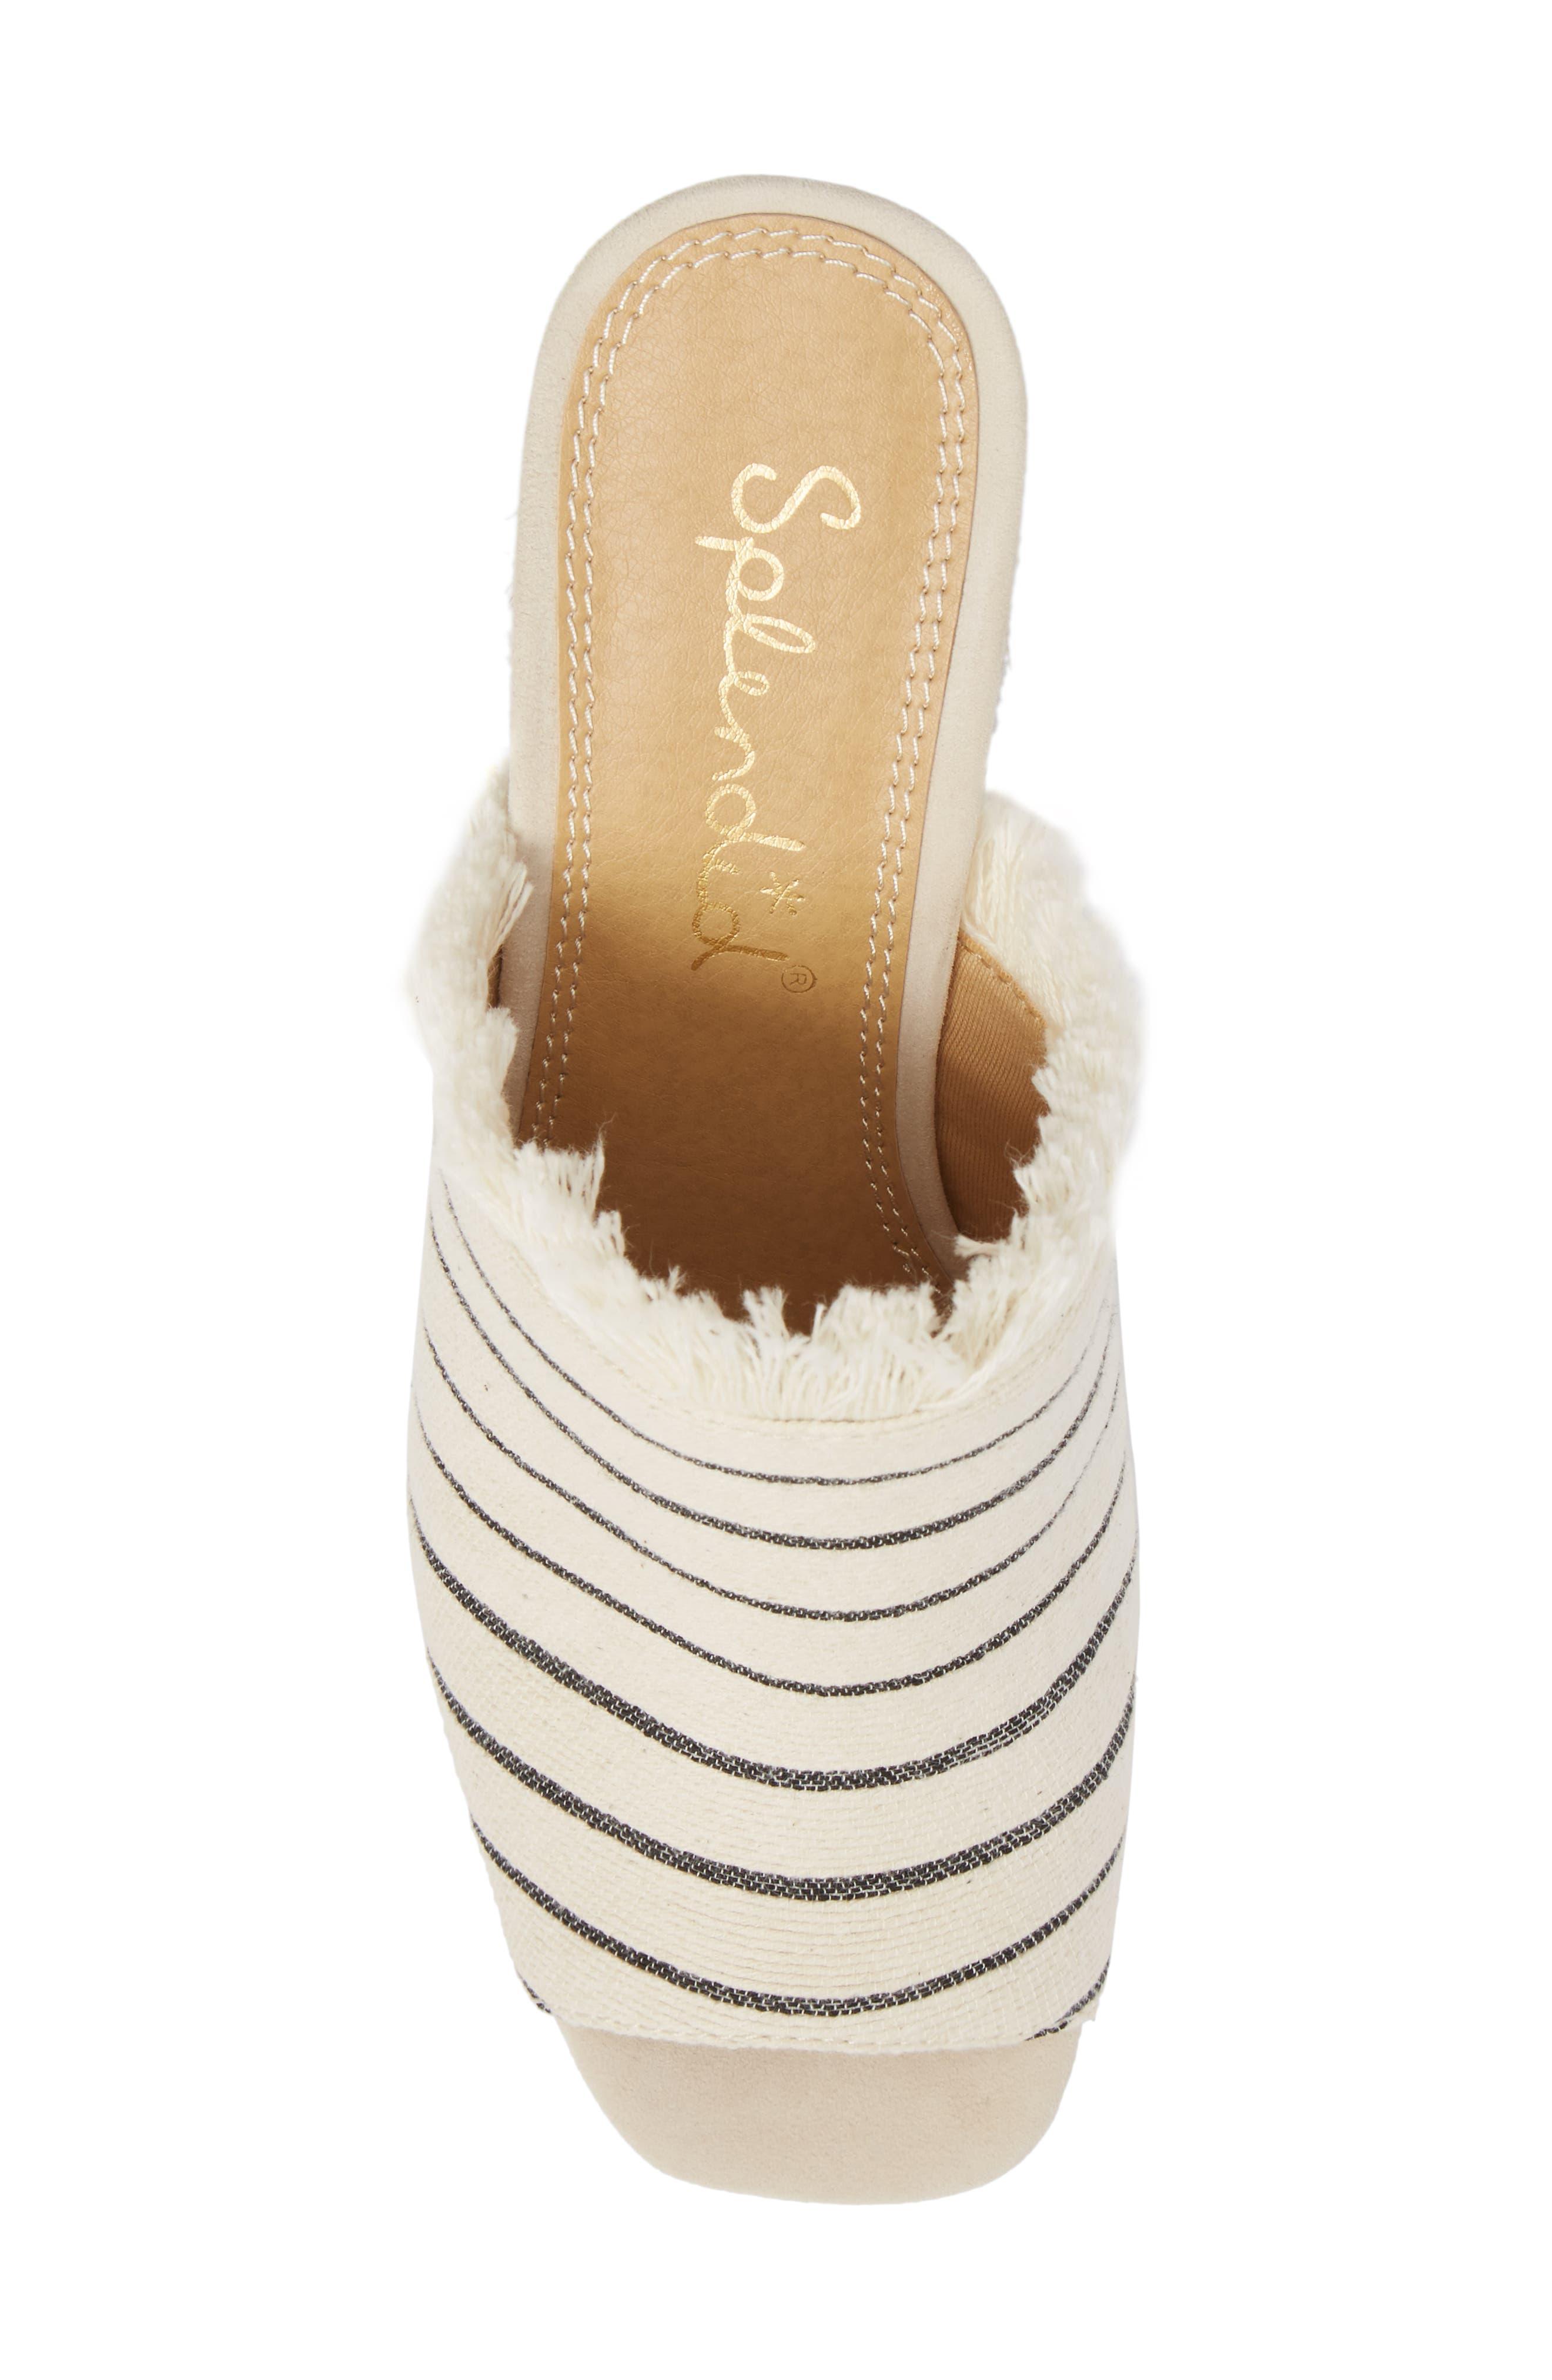 Baron Fringed Block Heel Slide,                             Alternate thumbnail 5, color,                             Cream Leather